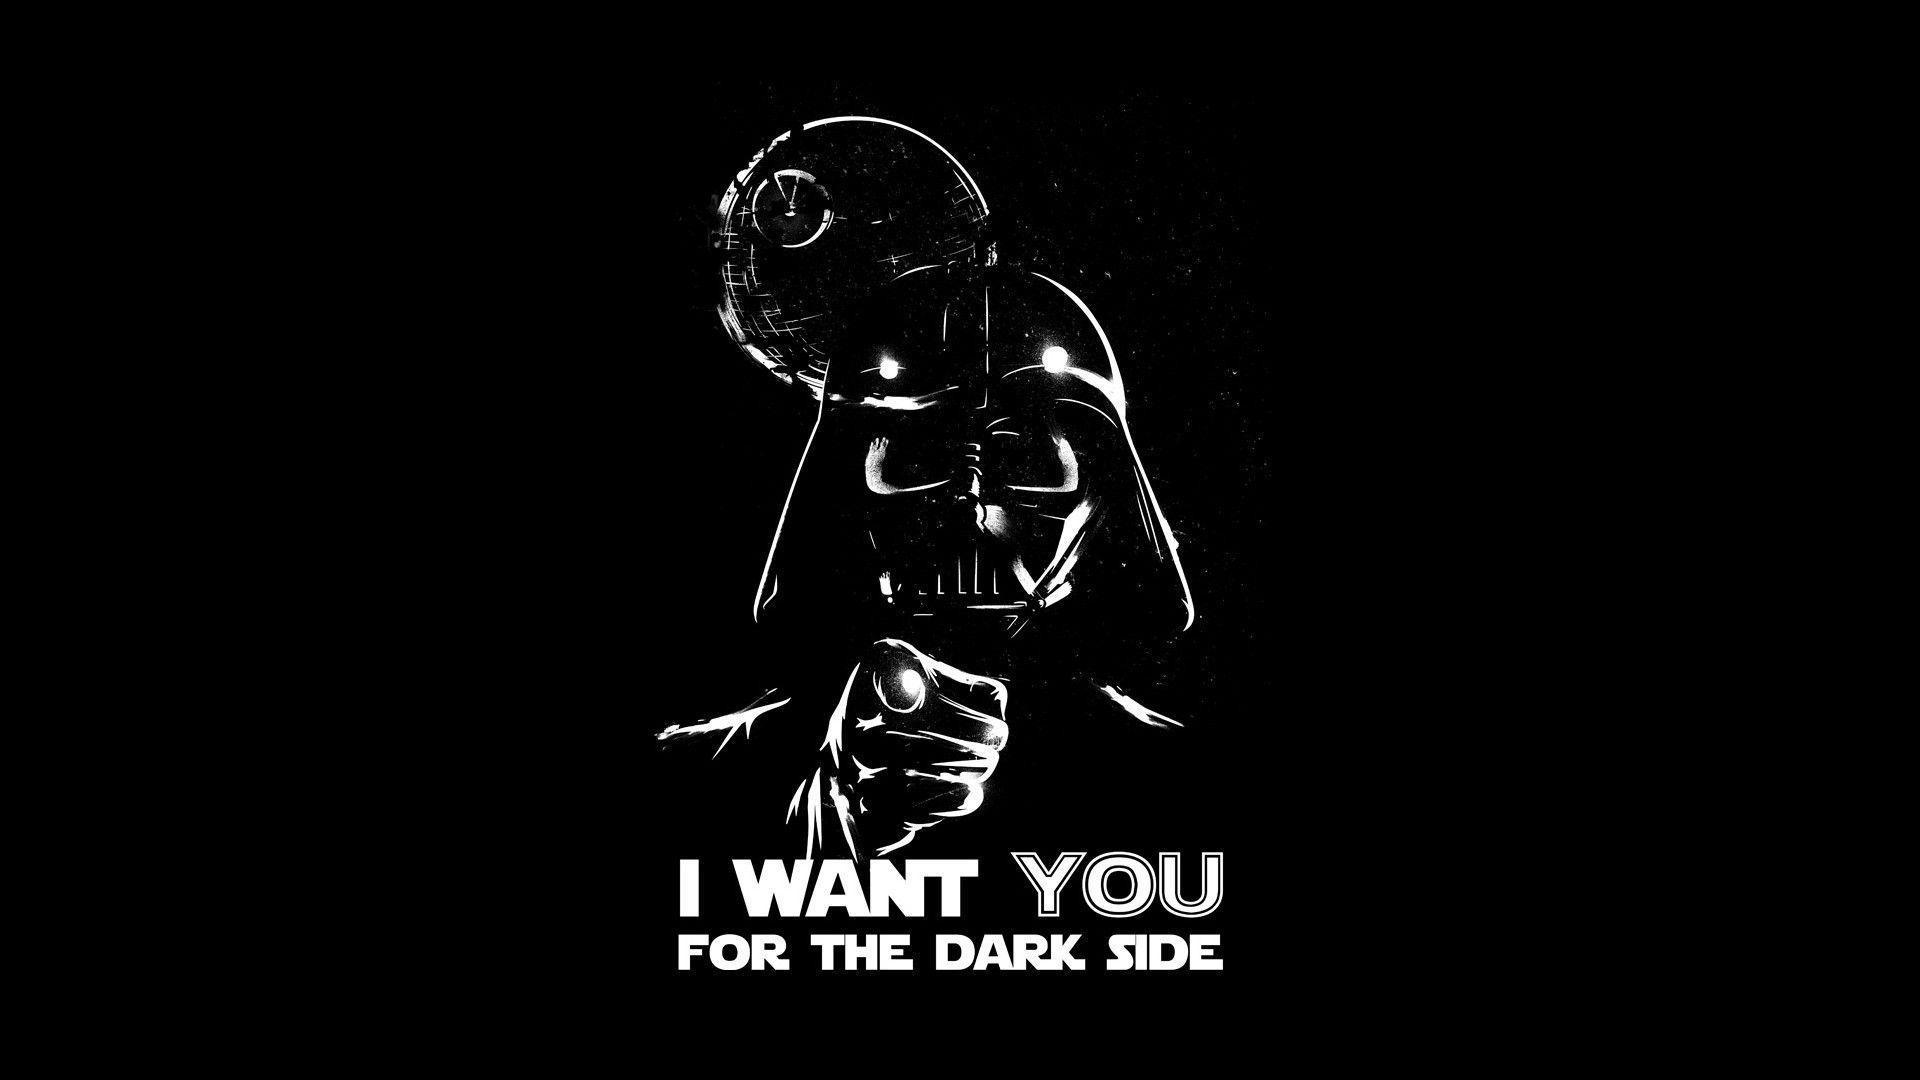 Darth Vader Star Wars Game HD Wallpaper | Free HD Desktop .